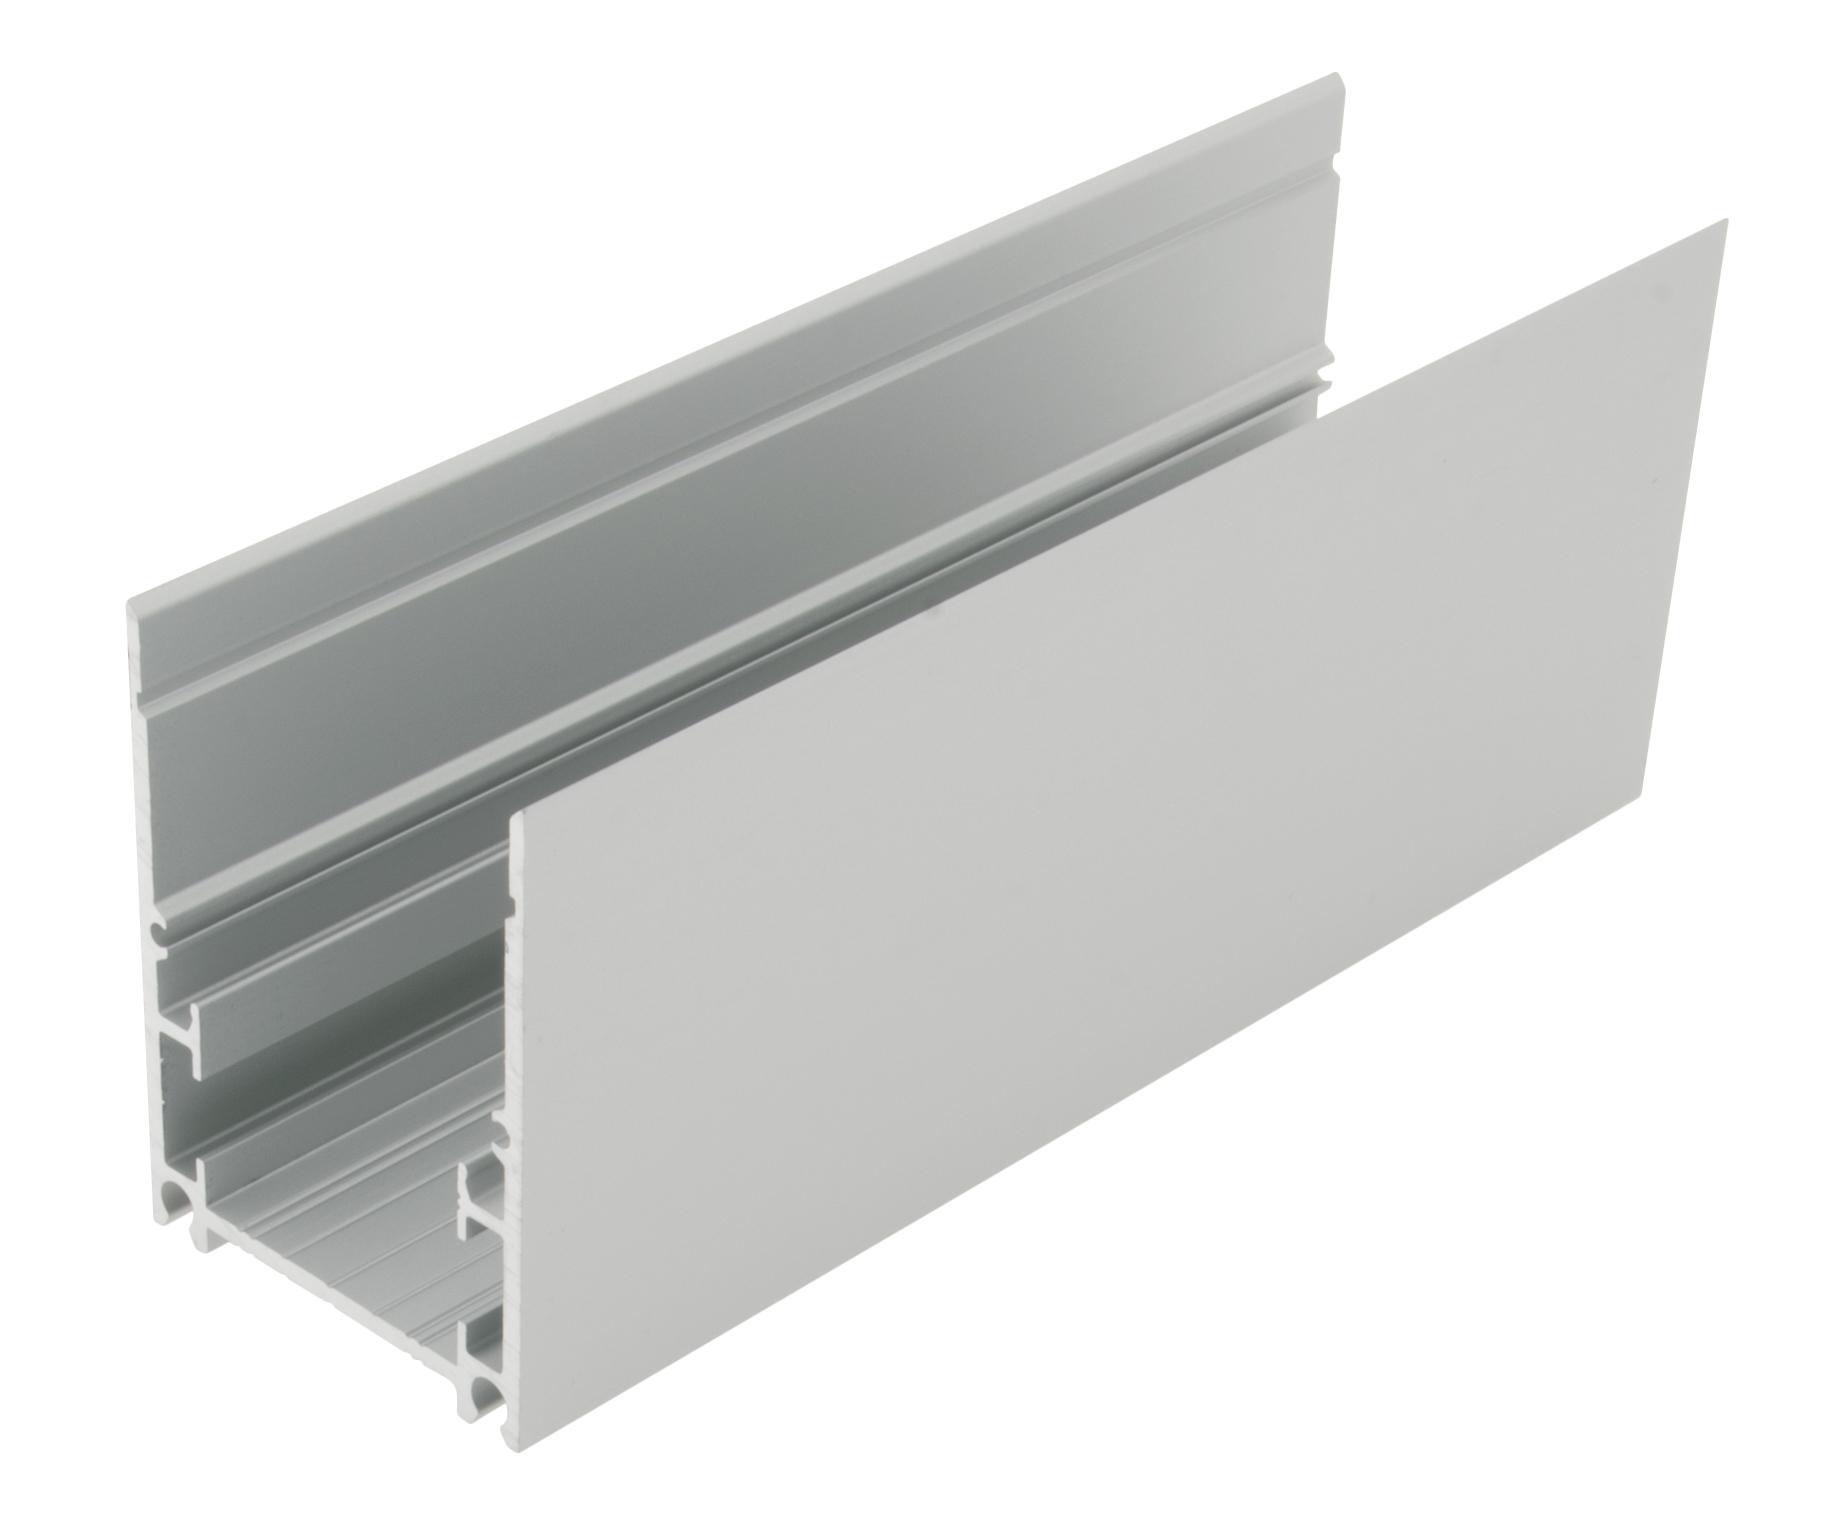 1 m Aluminium Profil MFR 2m LIAP005001